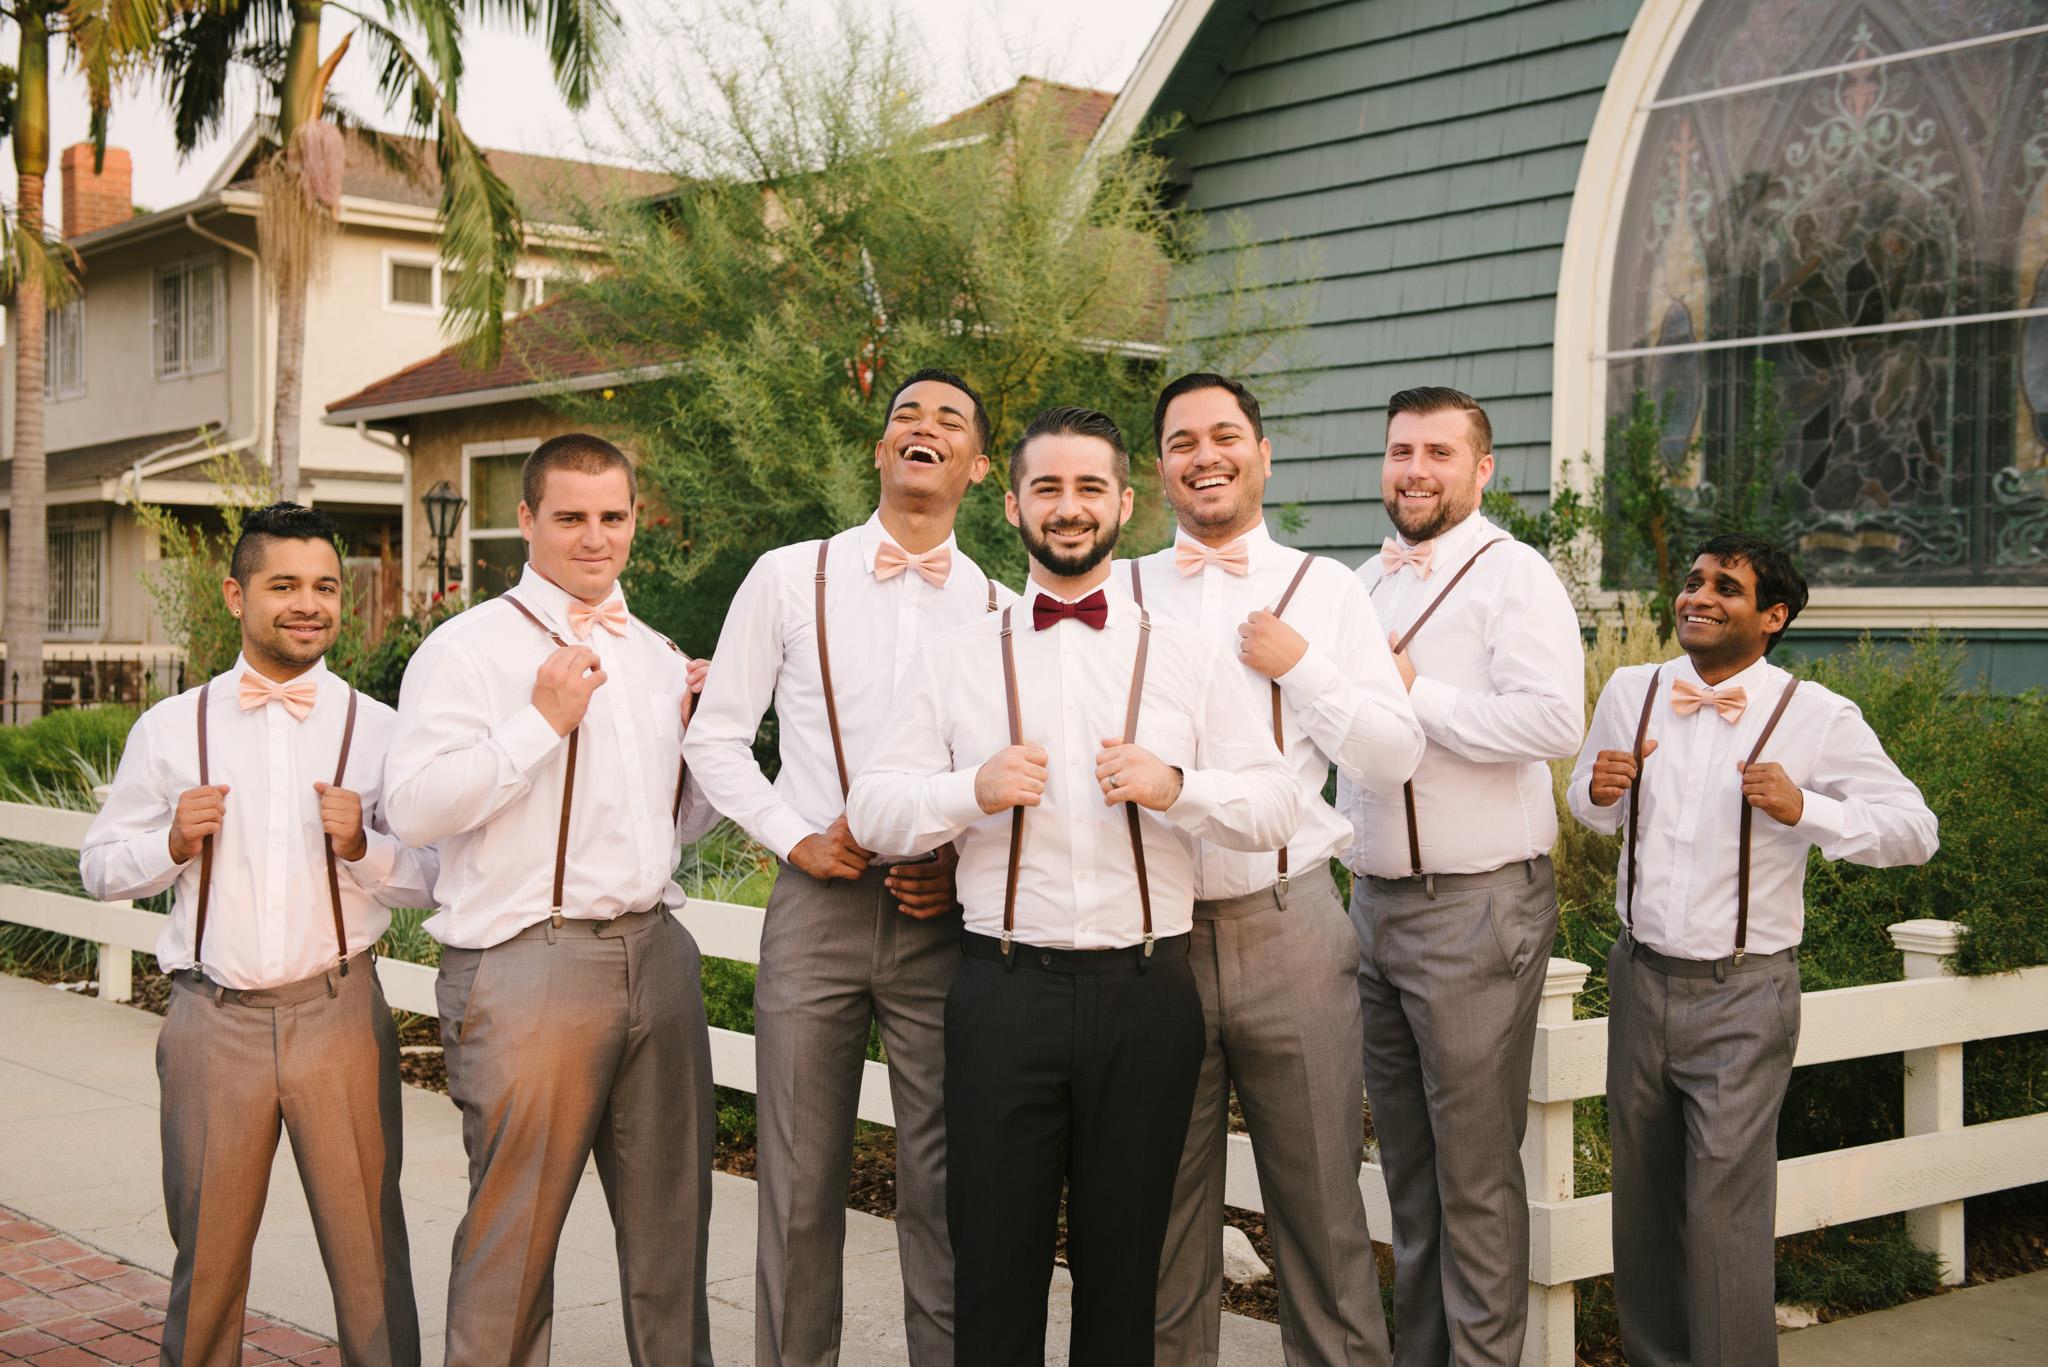 LJ-Ruby-Street-Los-Angeles-County-Wedding-Photography-18